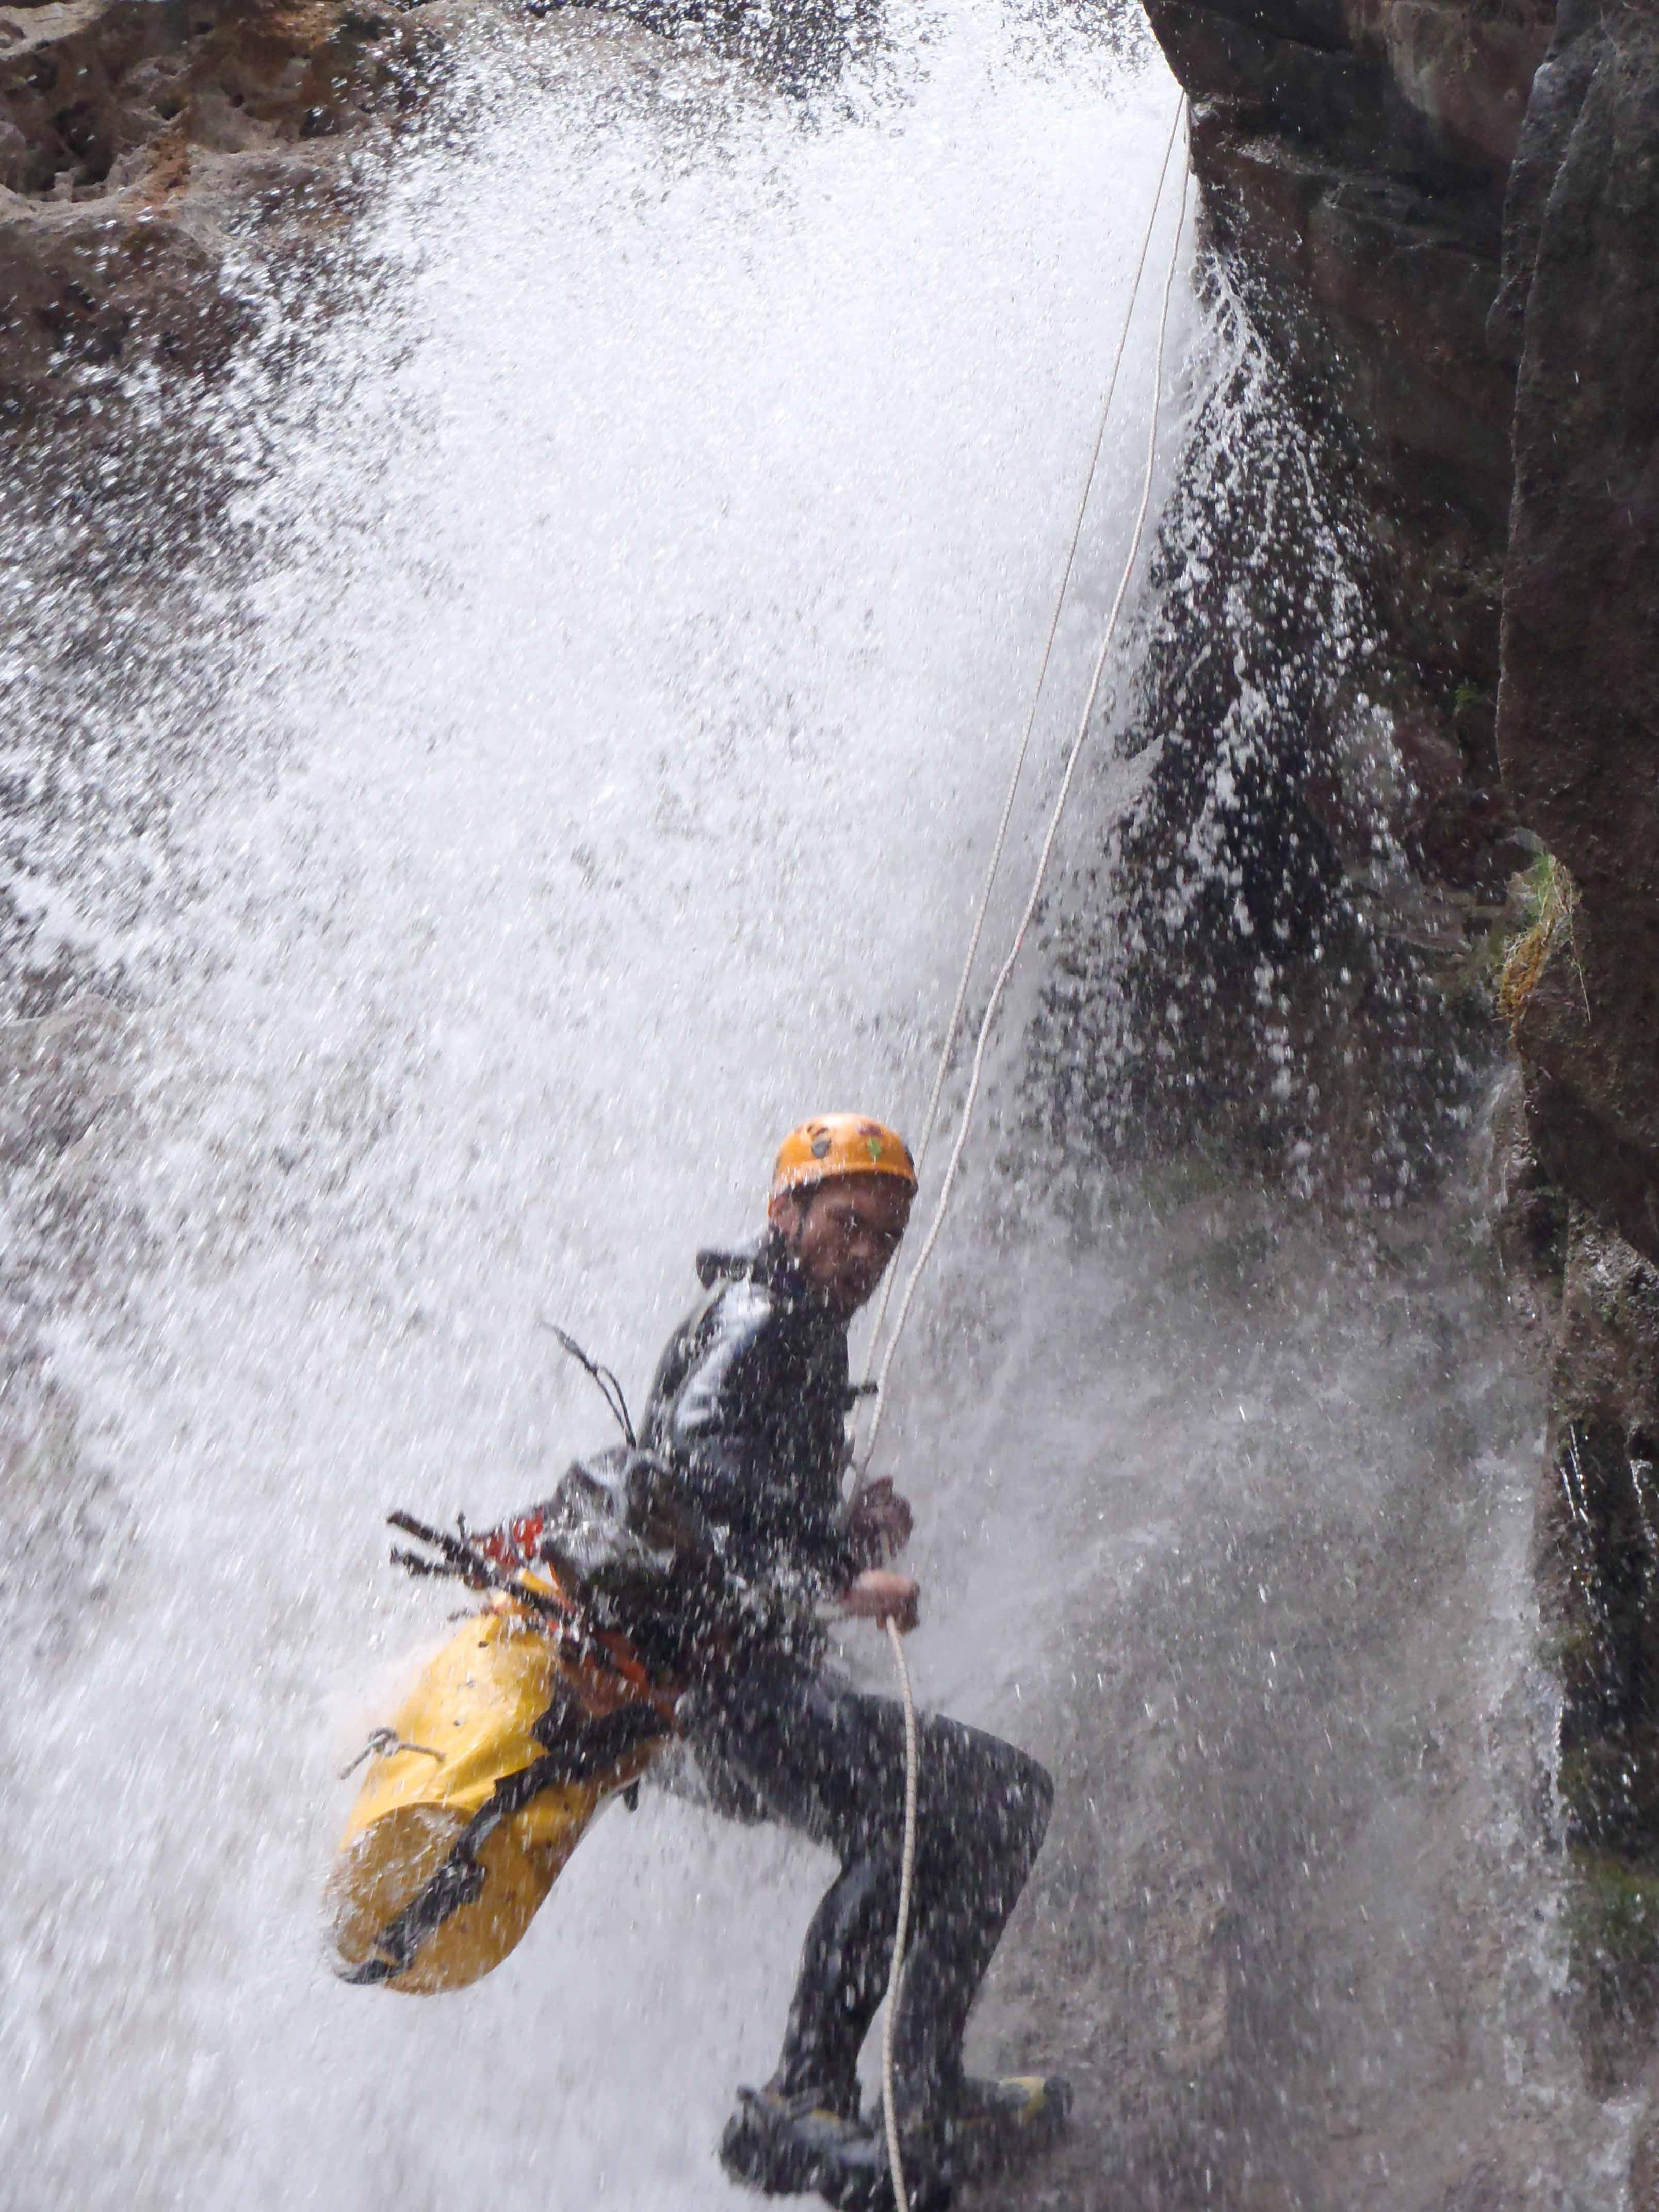 séjour canyon canyoning haute savoie sierra de guara alpes maritimes